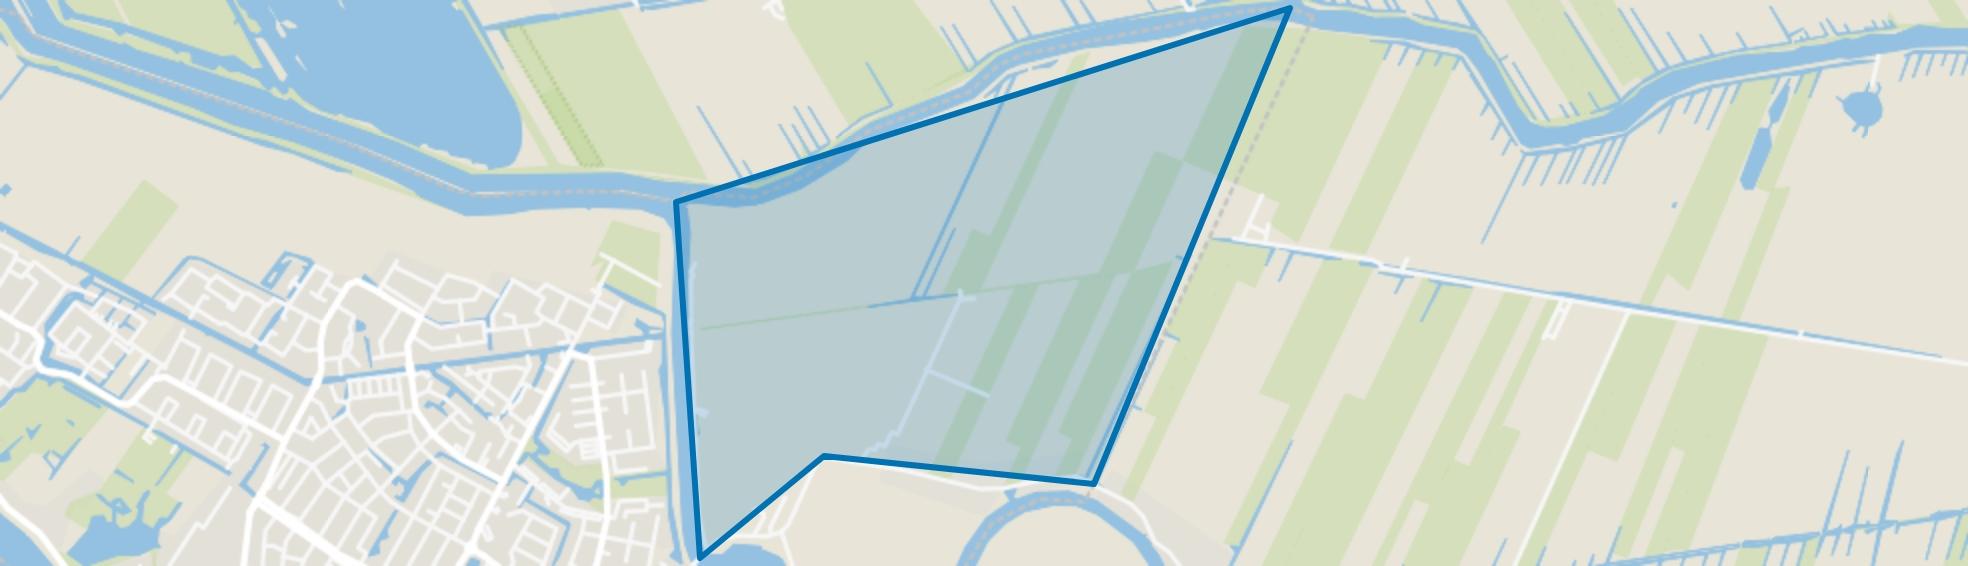 Polder Kortland, Alblasserdam map